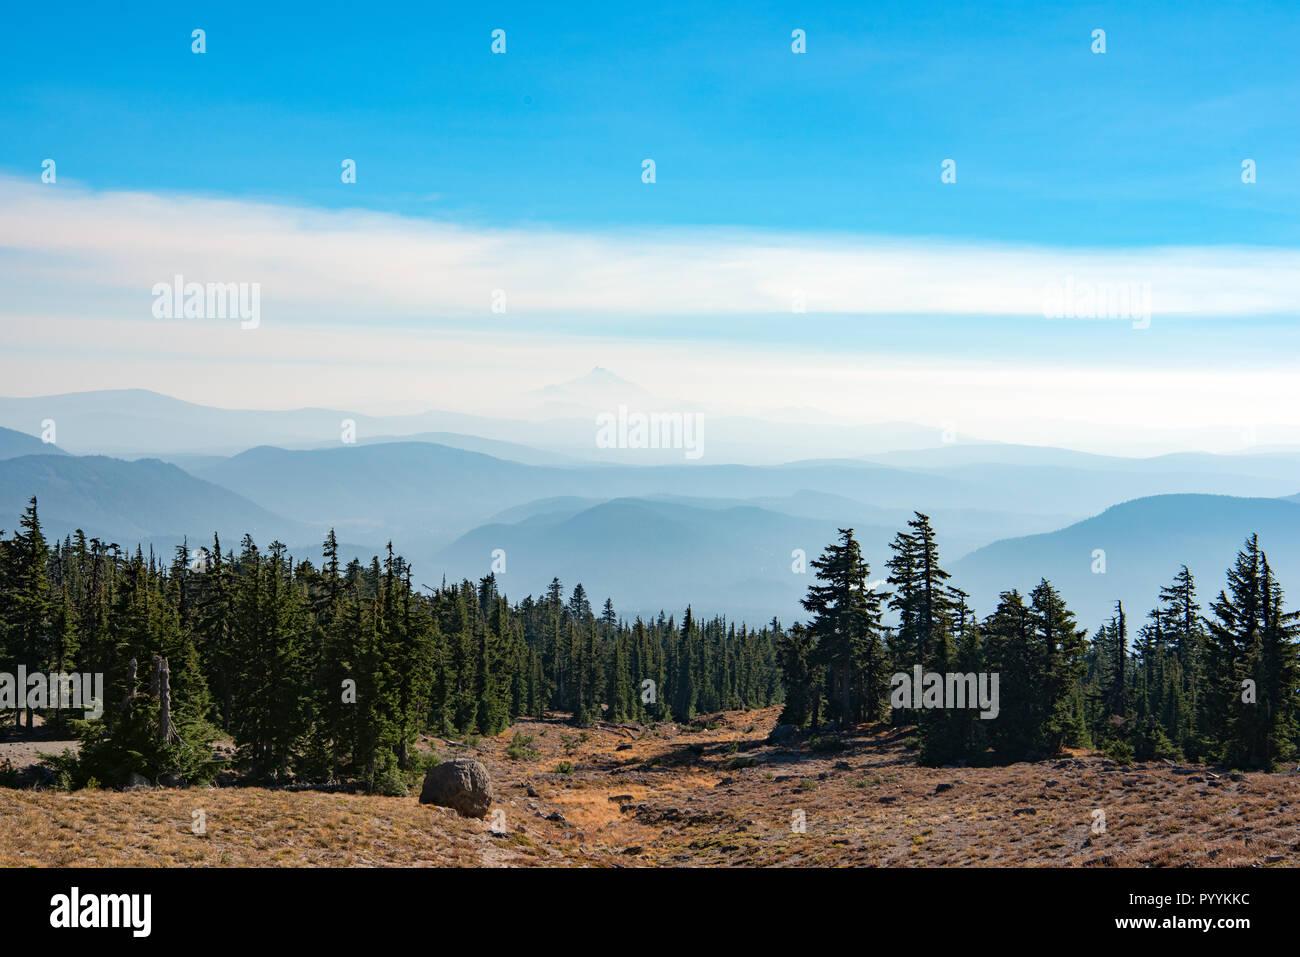 Mount Jefferson peak view from Mount Hood, Oregon, USA - Stock Image